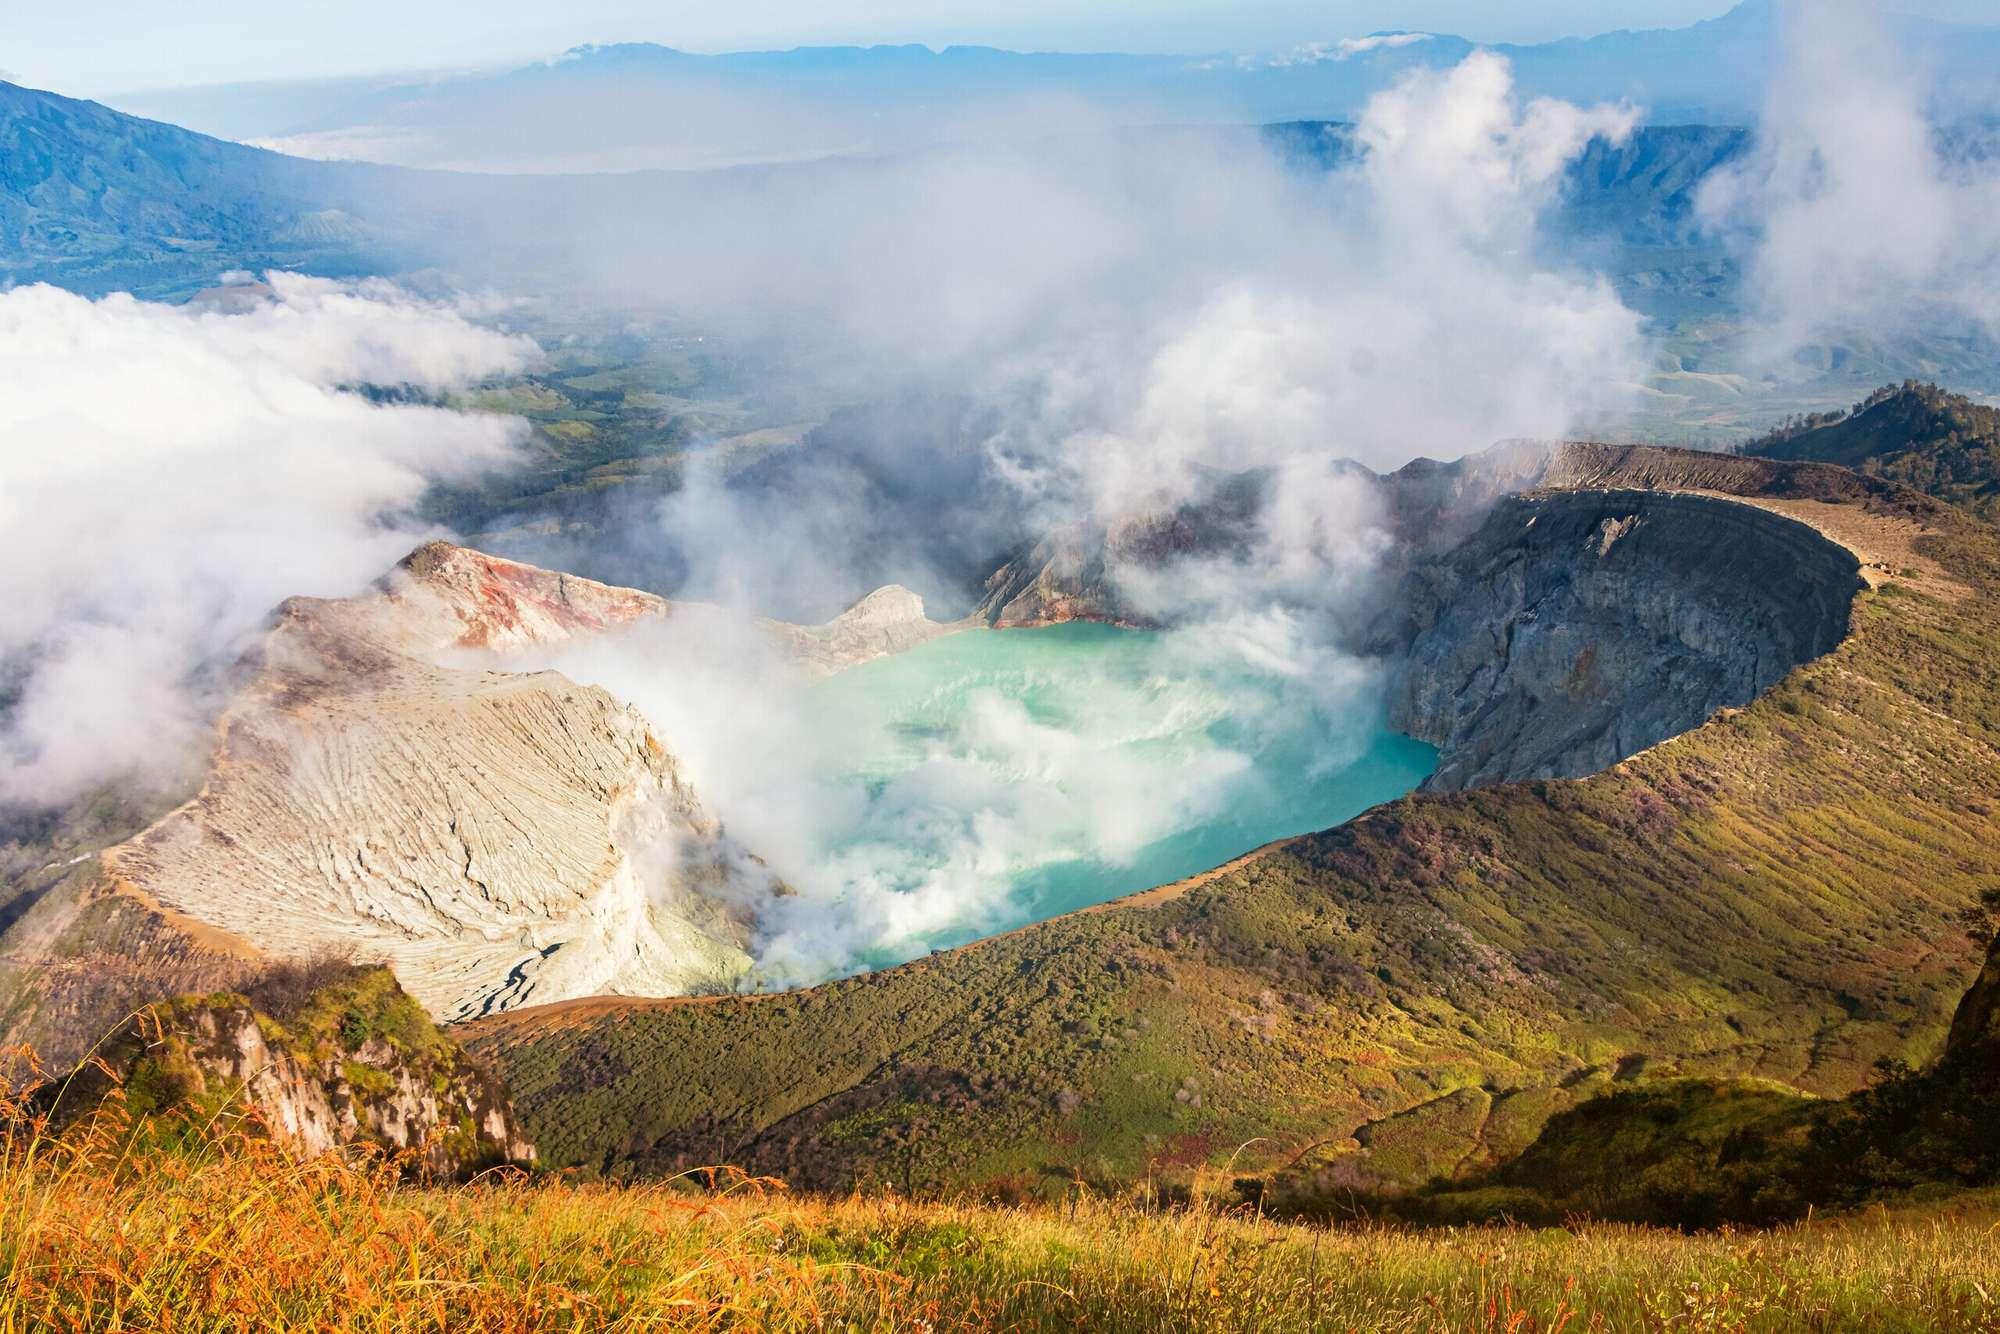 Bali et le Kawah Ijen